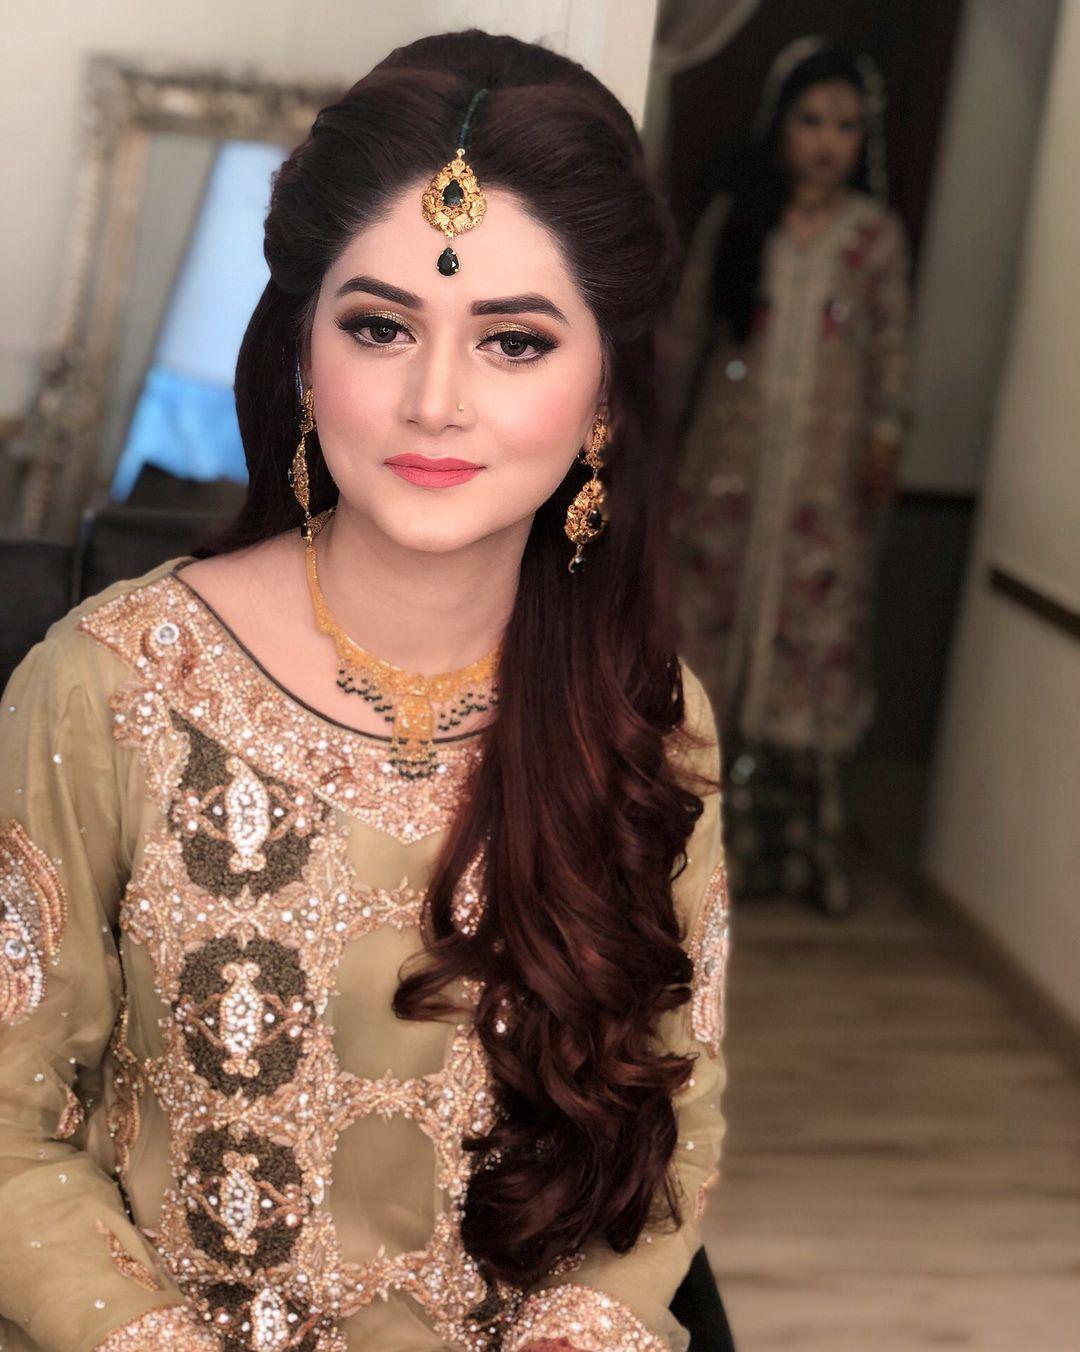 pin by sangeeta on sunmoon brides in 2019 | wedding